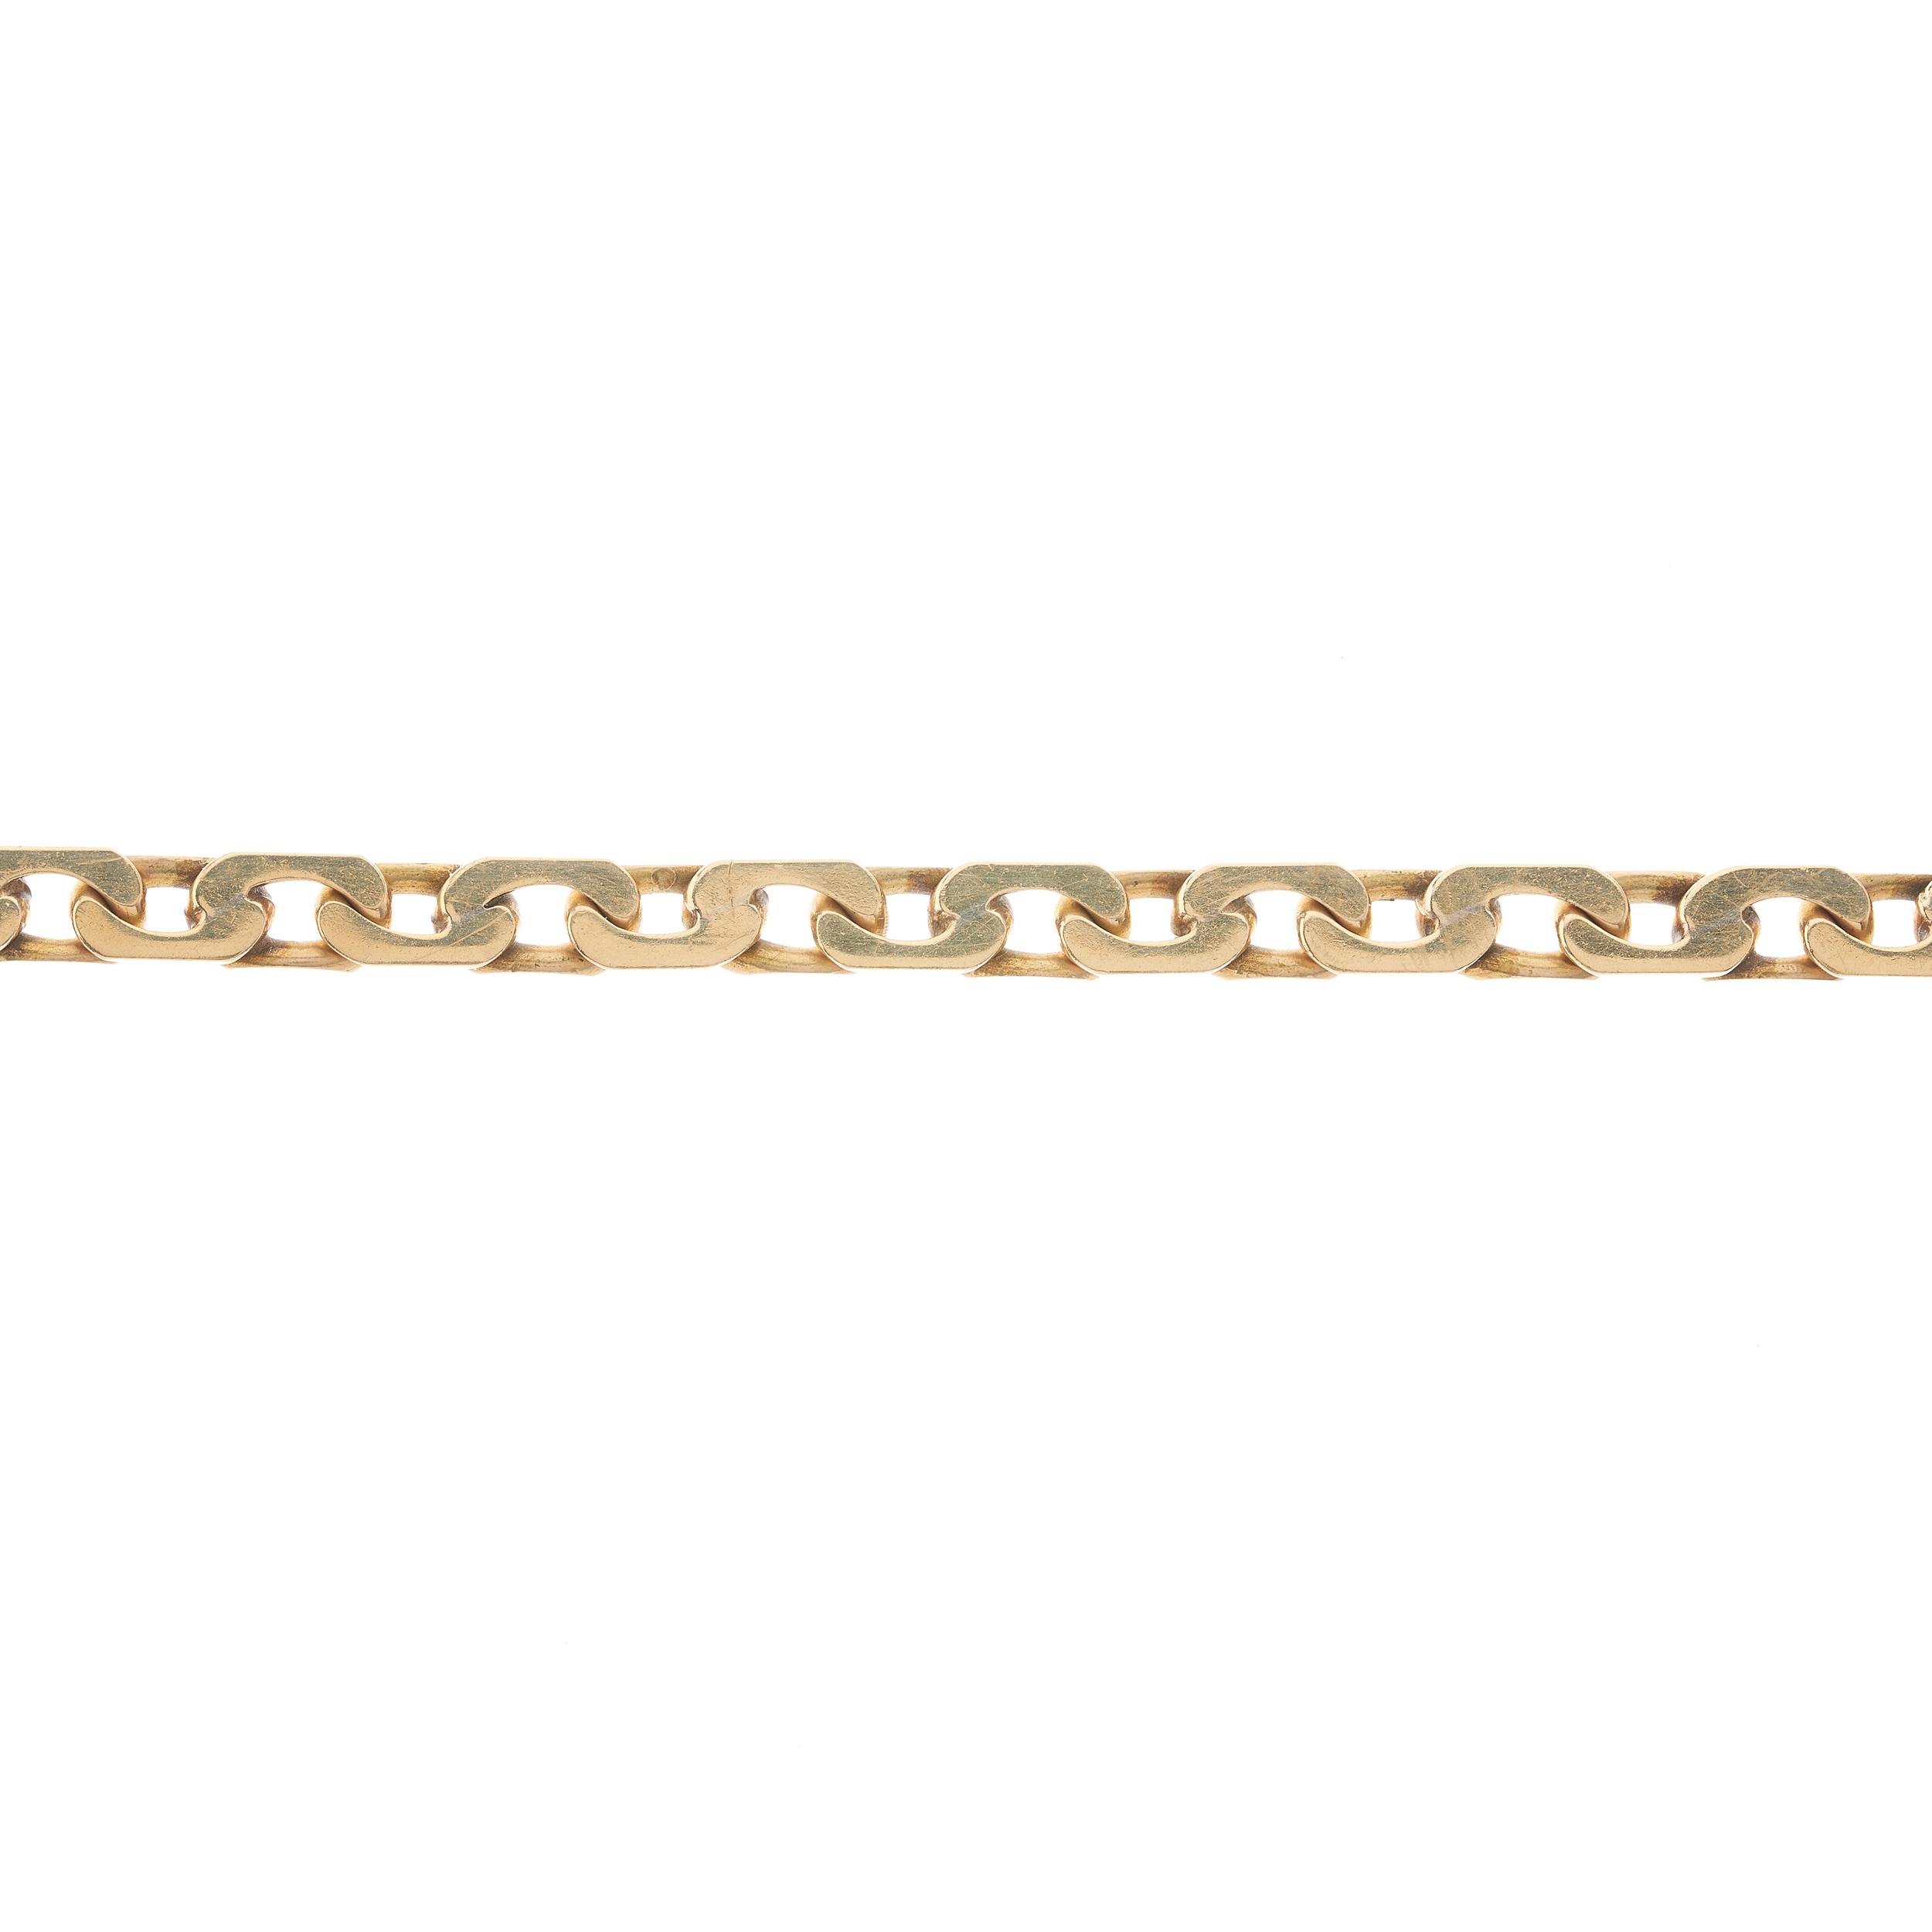 A 1970s 9ct gold flat curb-link bracelet